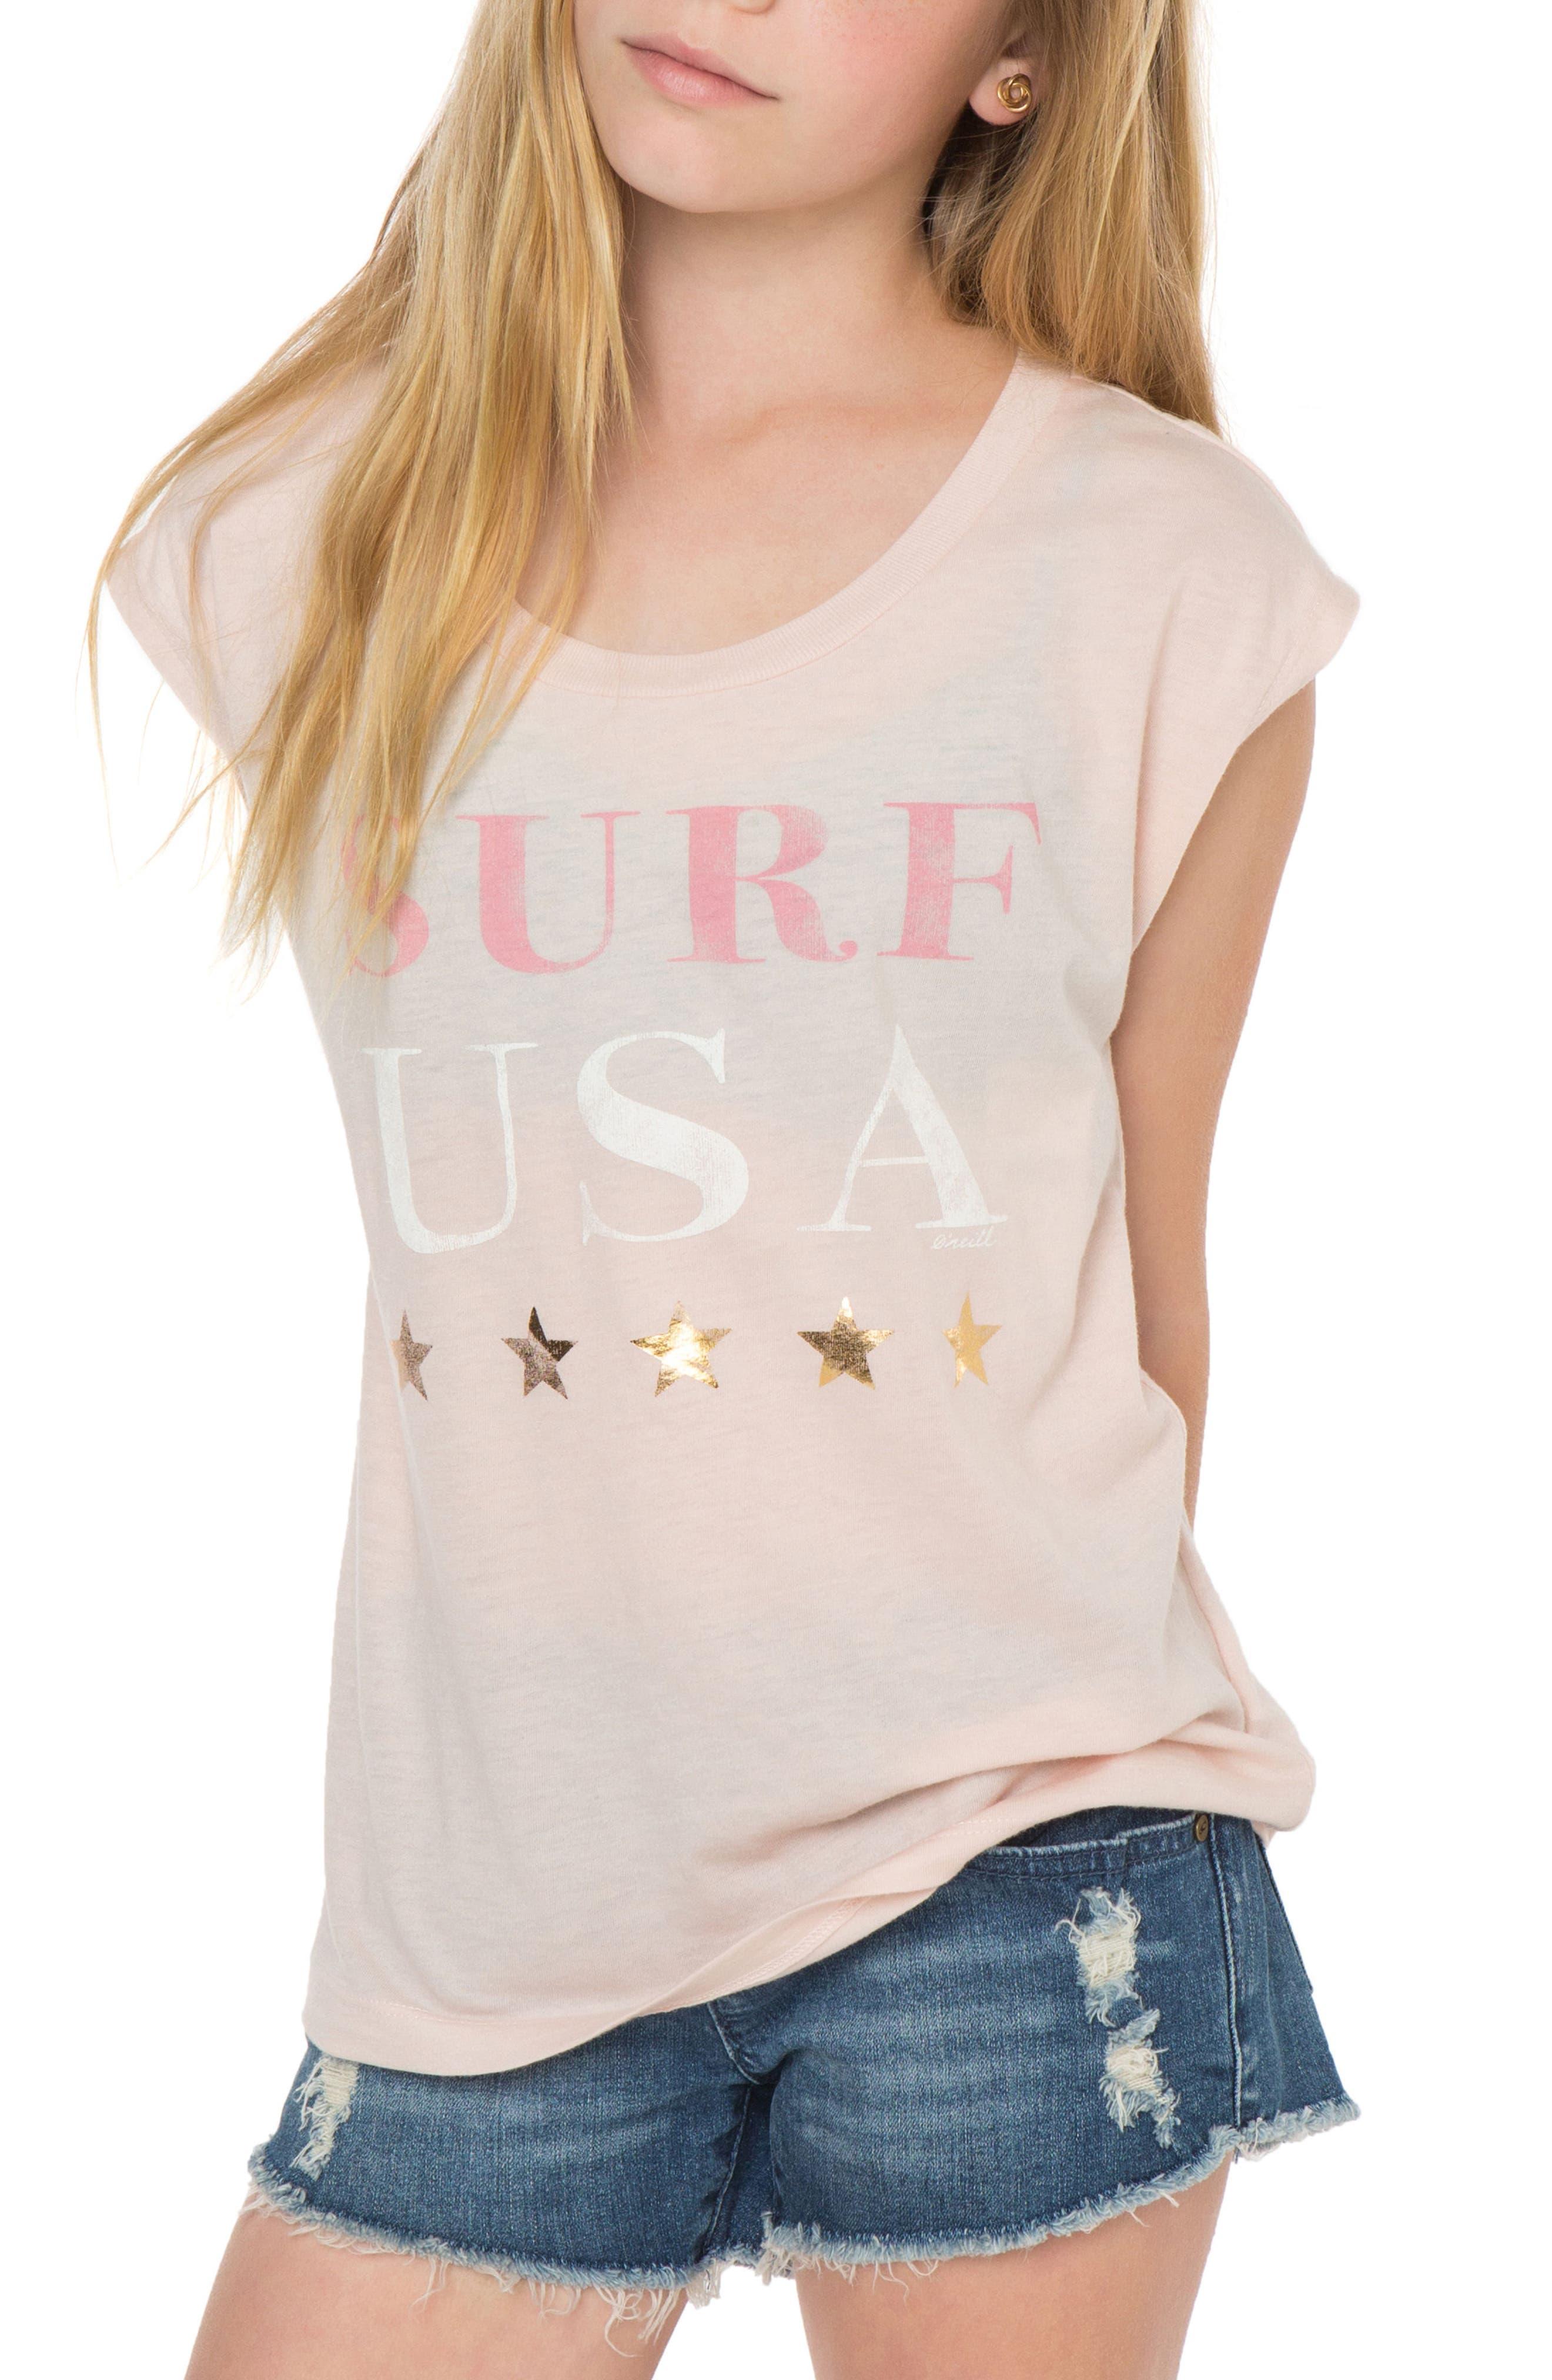 O'Neill Surf USA Graphic Tee (Big Girls)